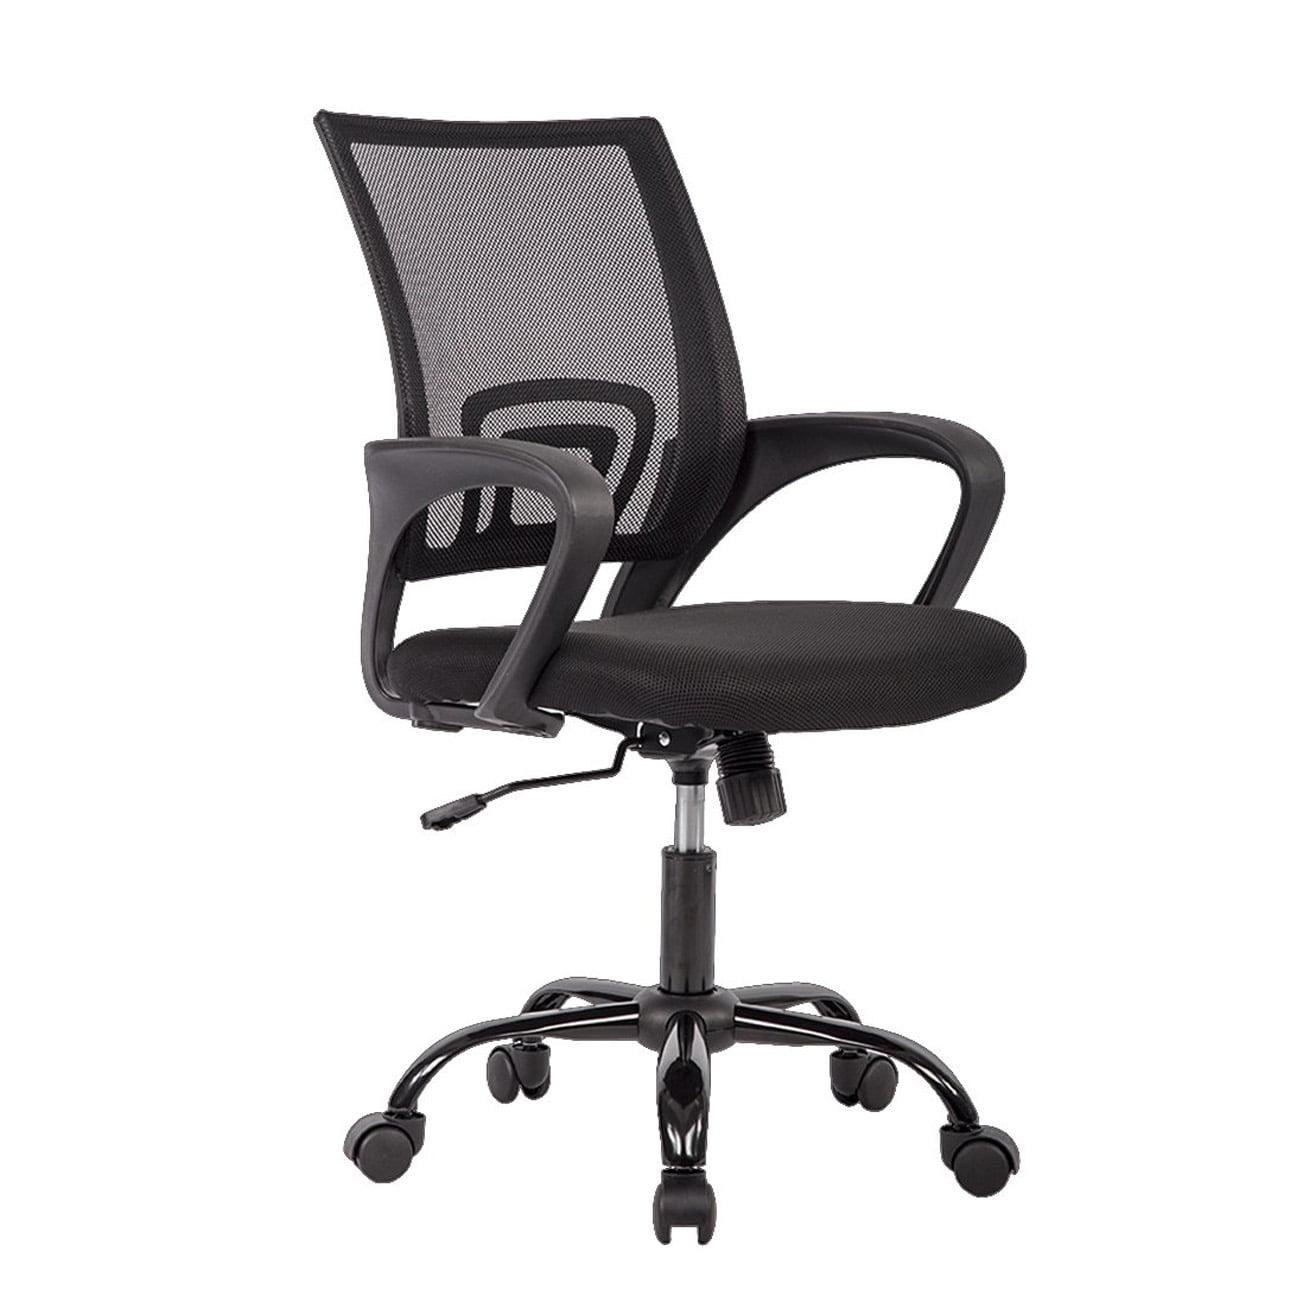 Miraculous Black Chair Desk Ergonomic Swivel Executive Adjustable Task Midback Computer Stool With Arm Cjindustries Chair Design For Home Cjindustriesco